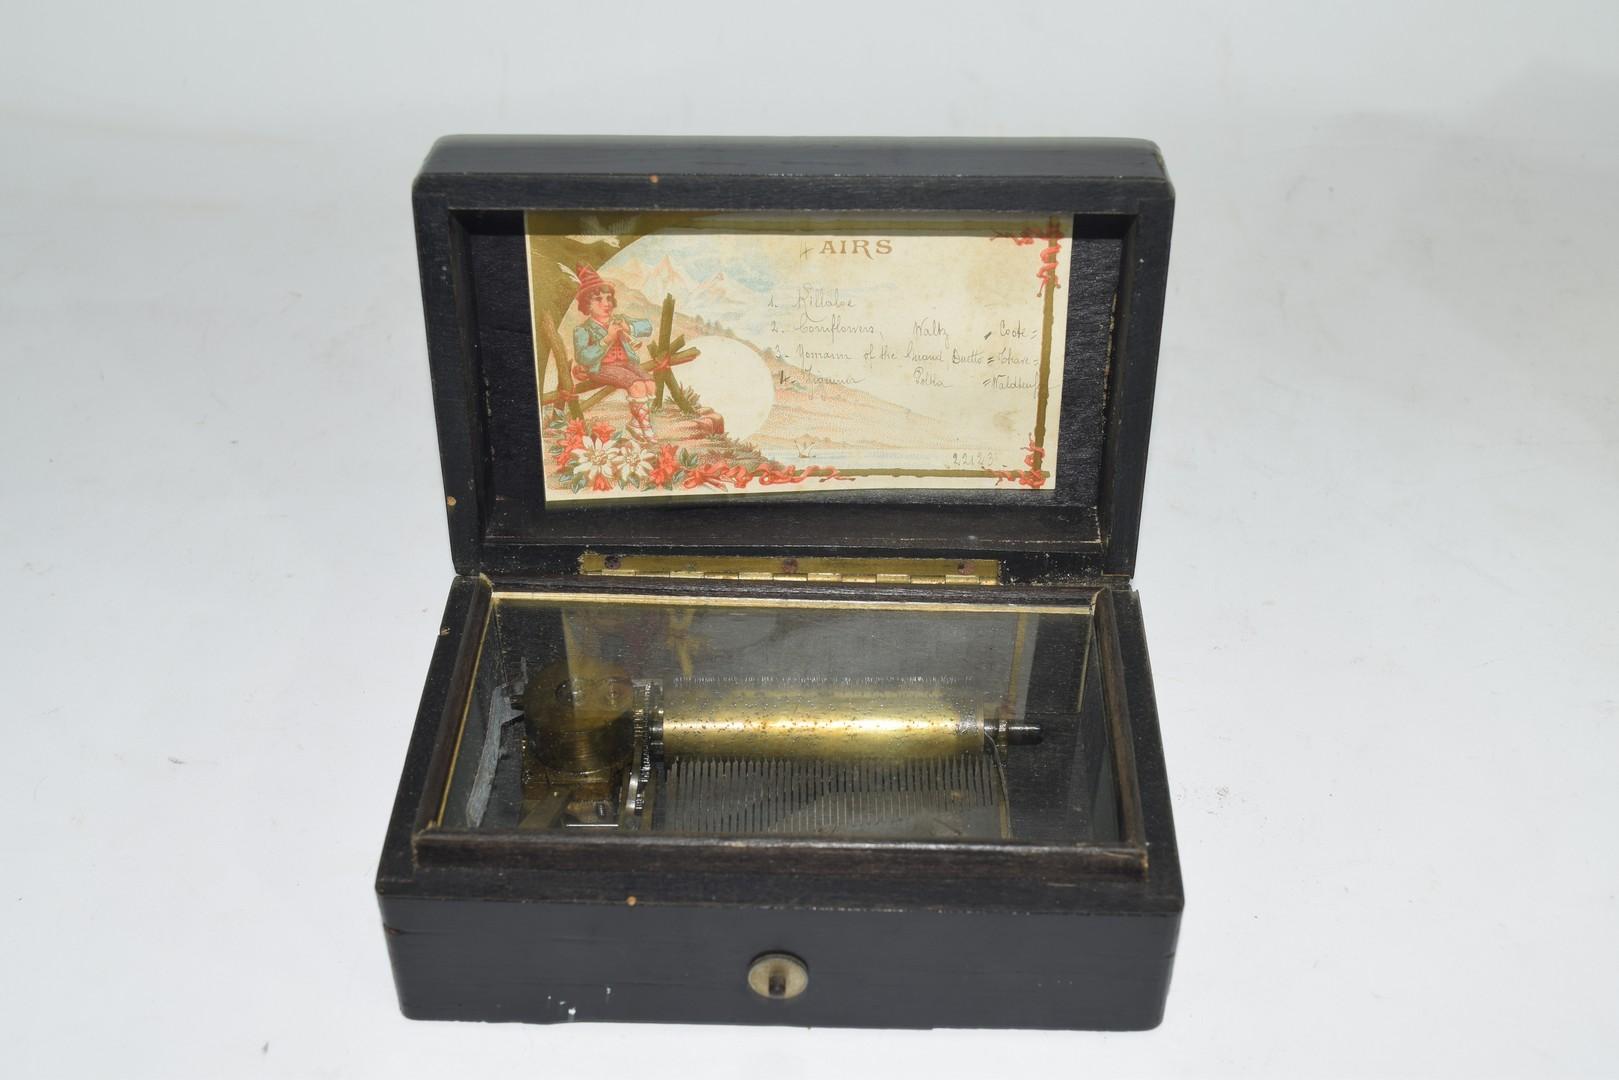 Miniature music box - Image 2 of 5